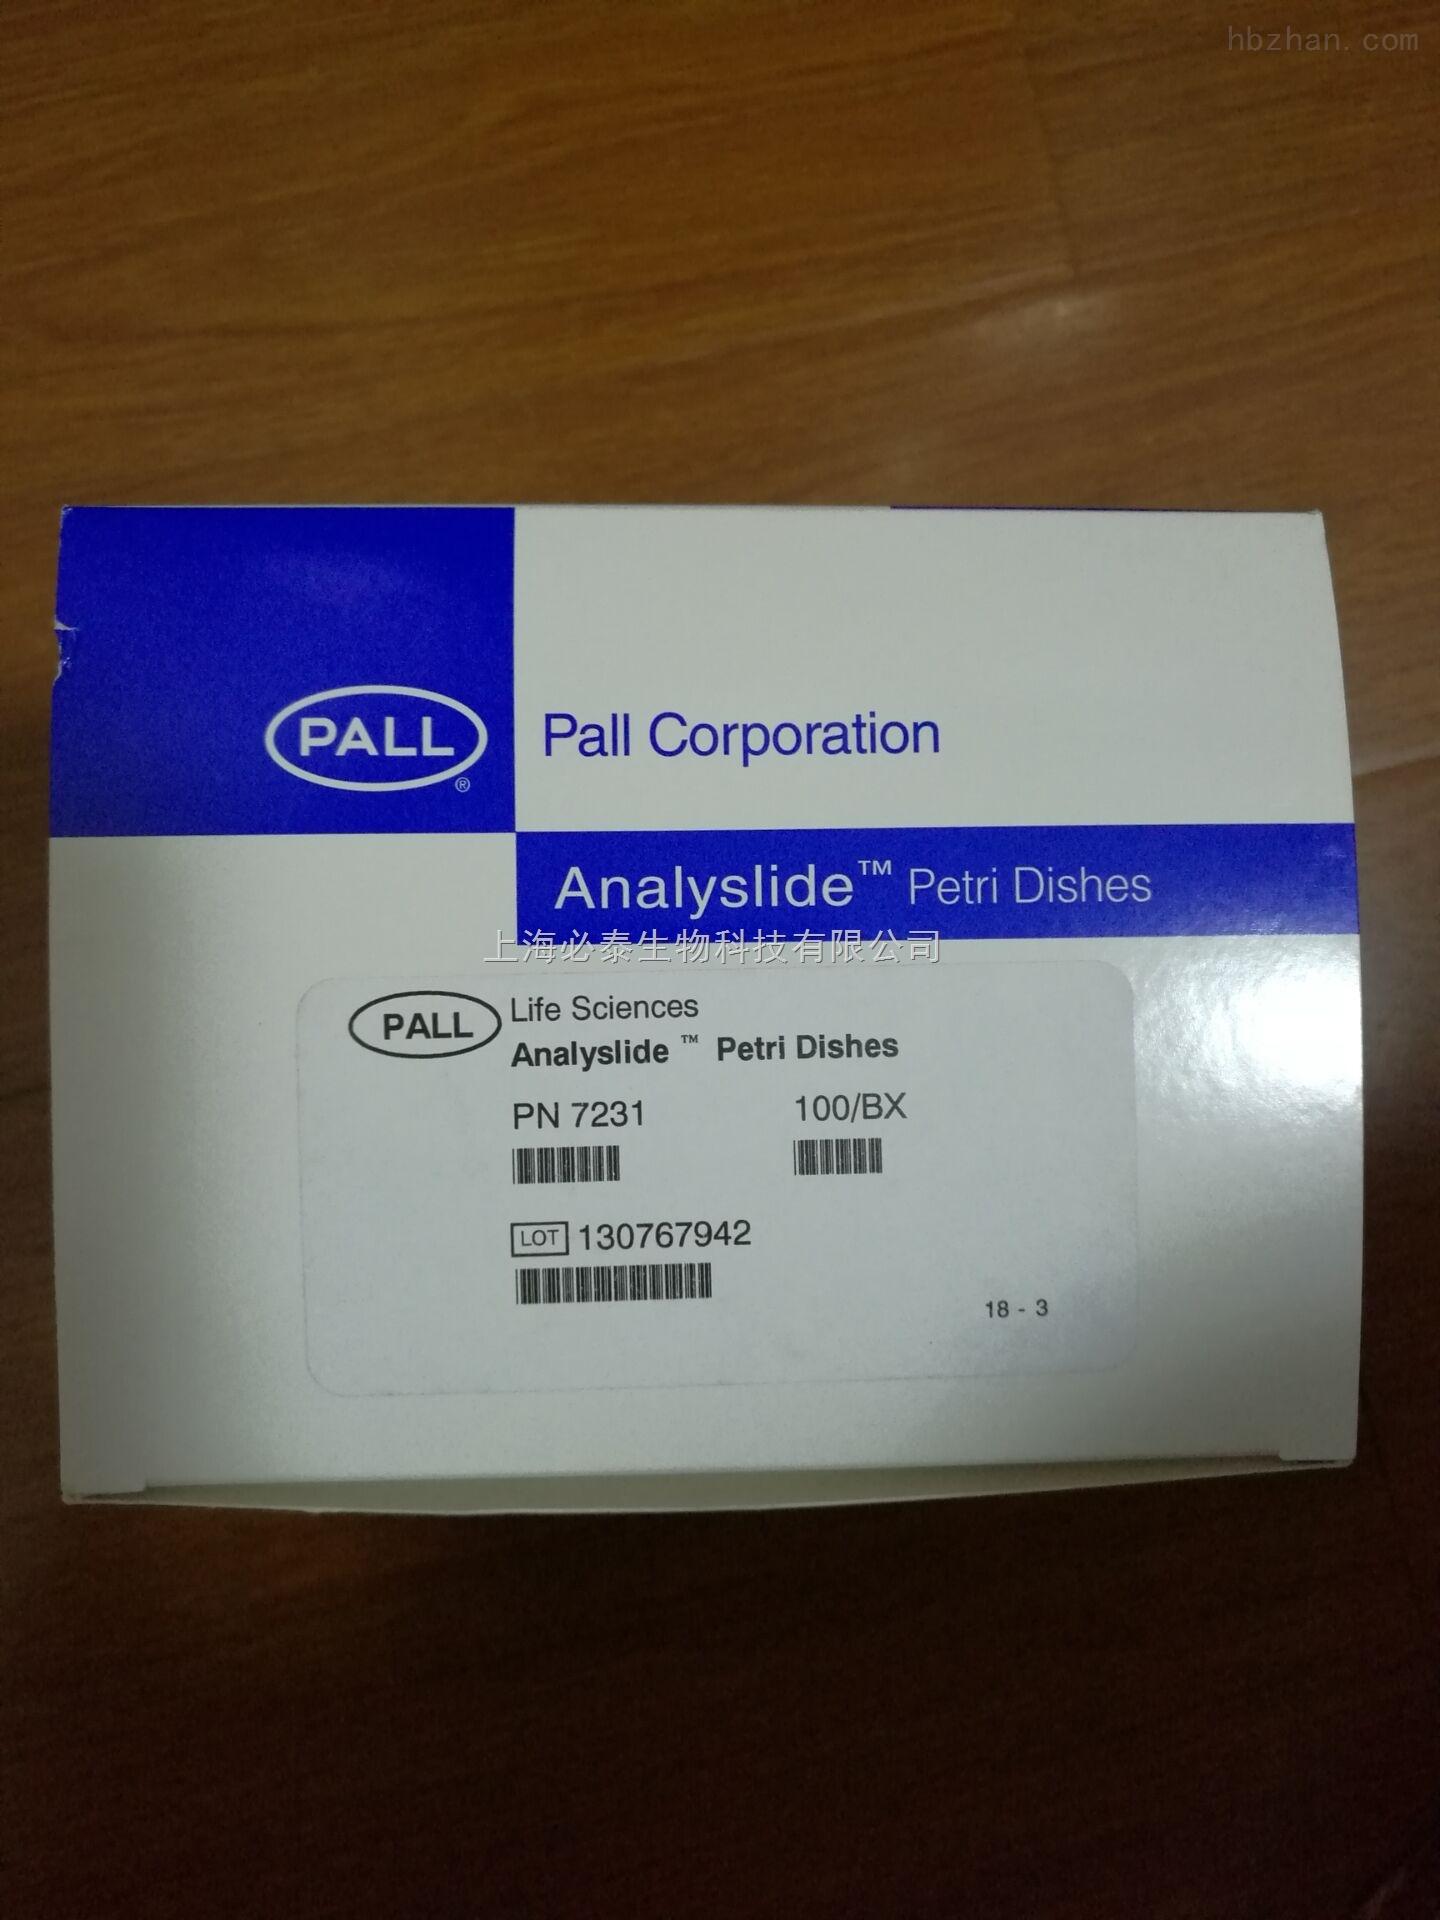 美国Pall Analyslide® Petri Dish培养皿